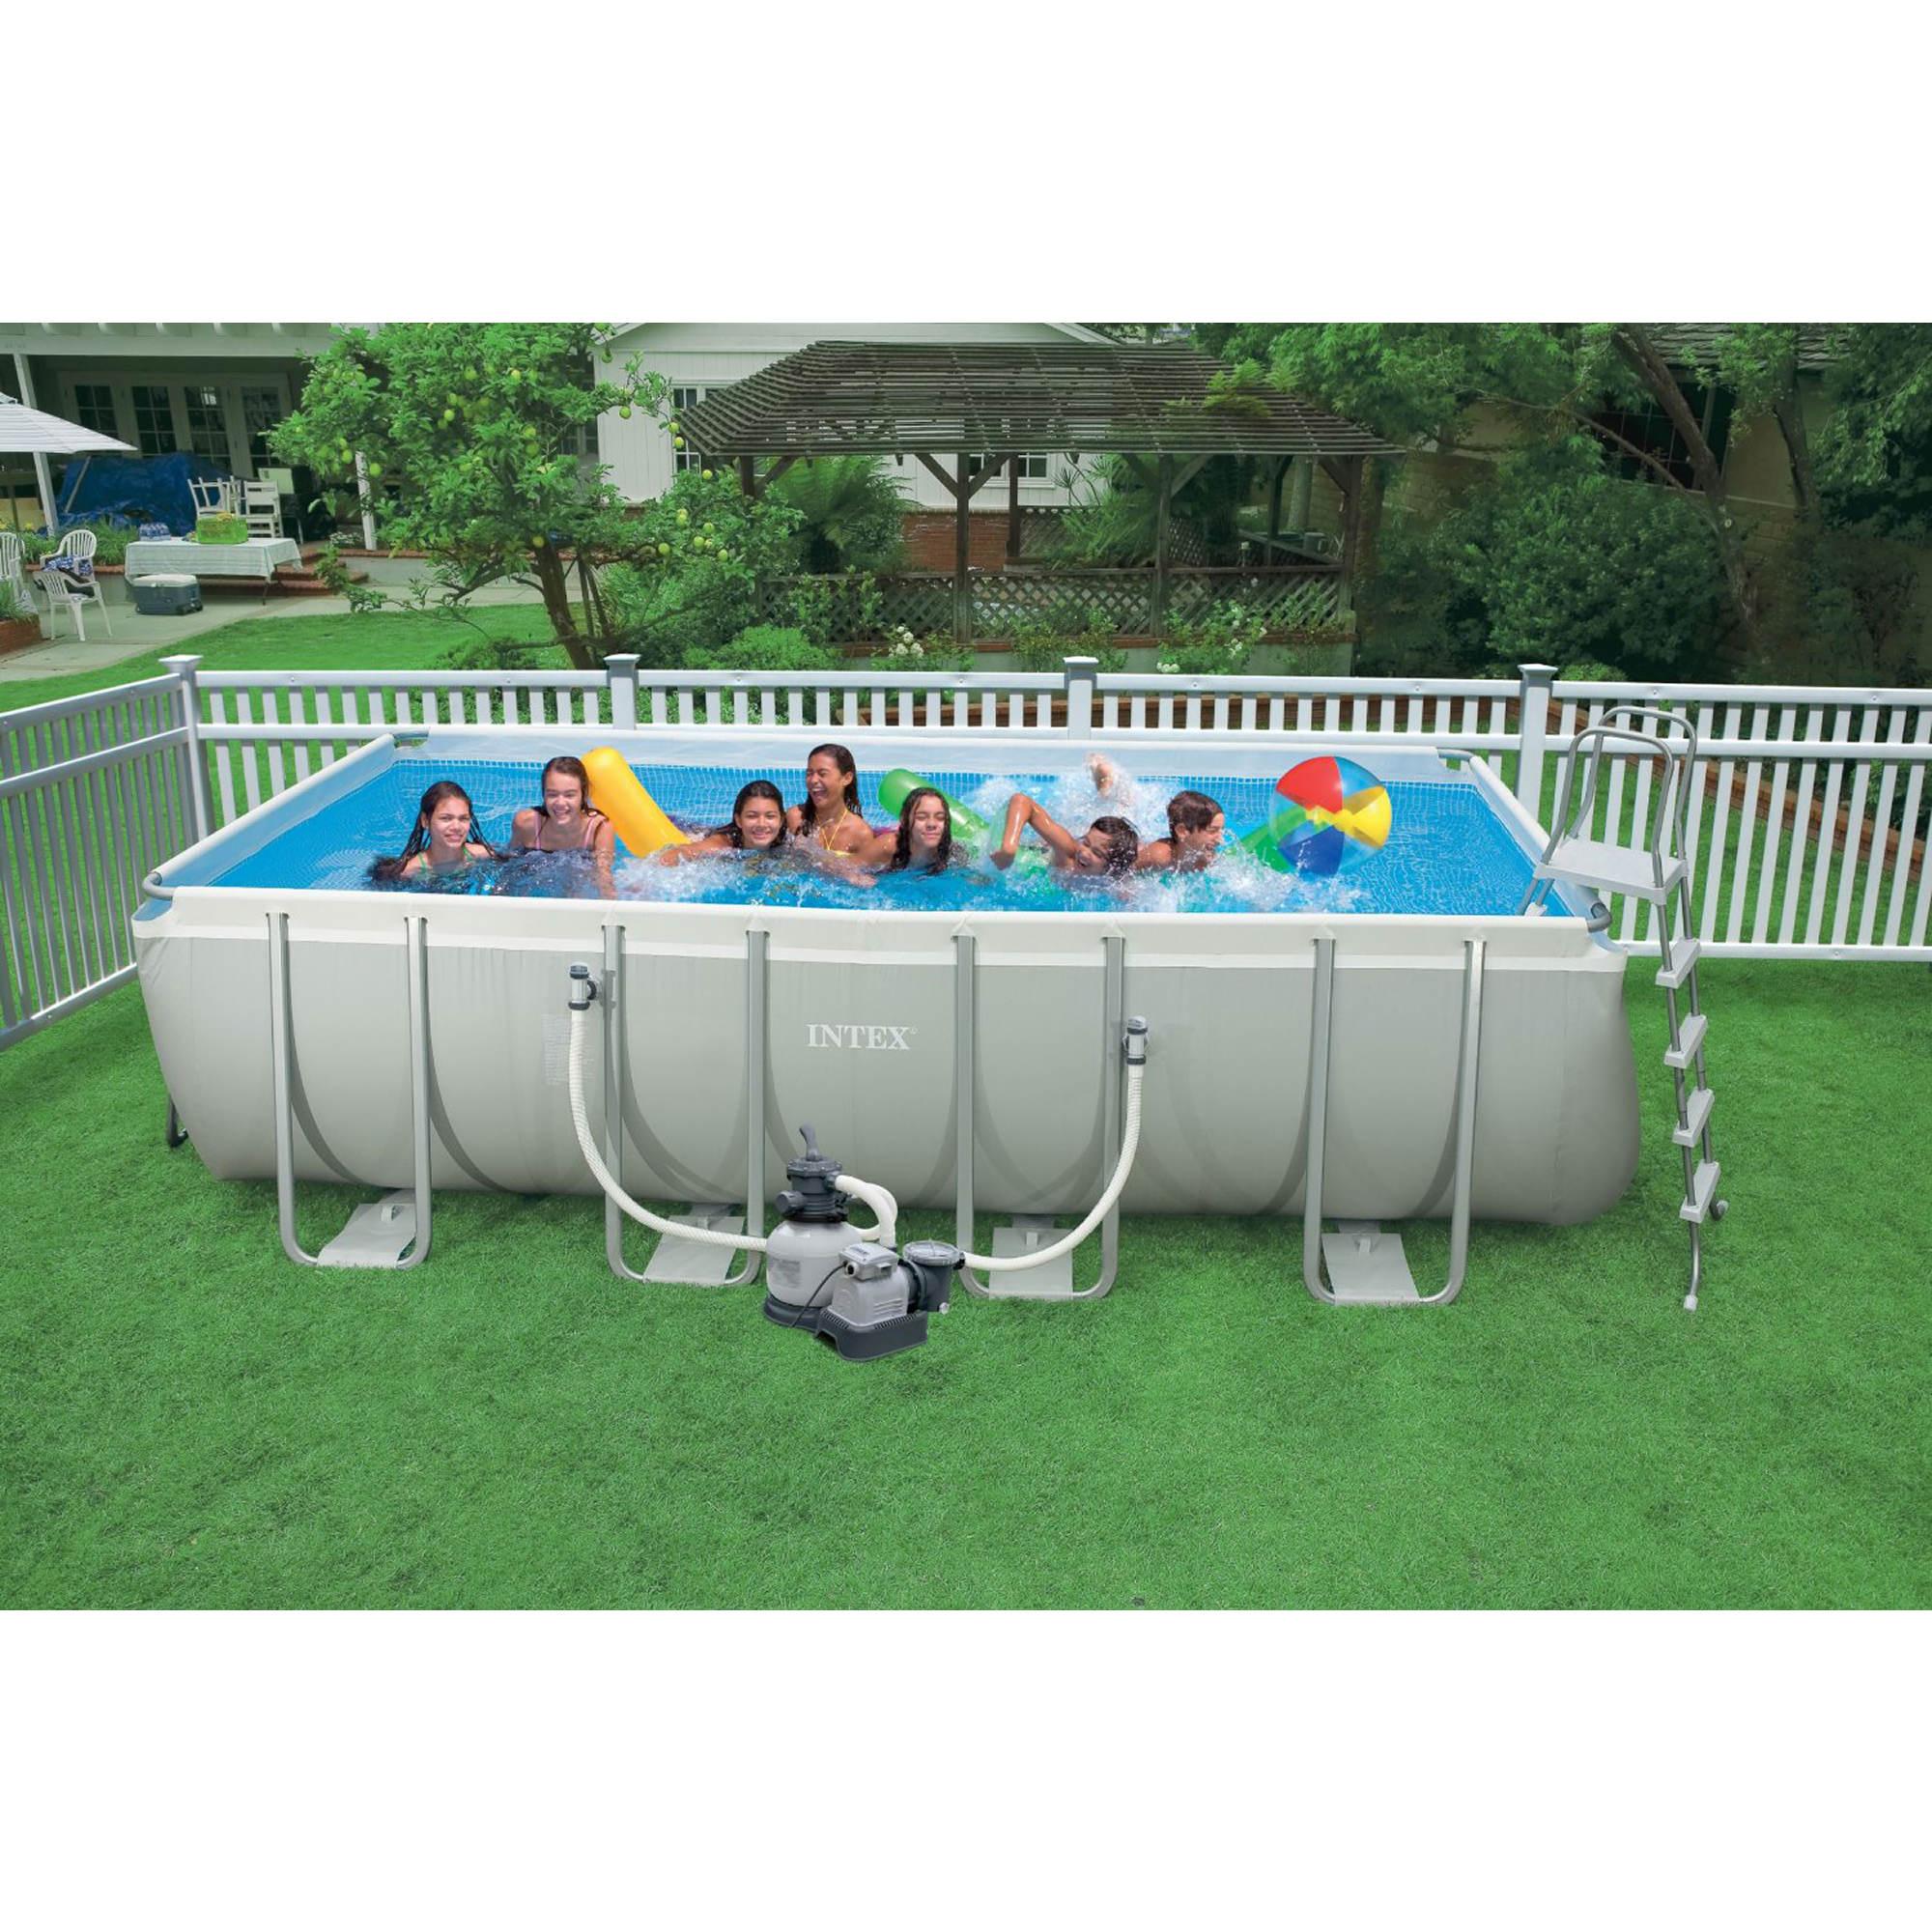 Intex 18 39 X 9 39 X 52 Rectangular Aboveground Ultra Frame Pool Bj 39 S Wholesale Club